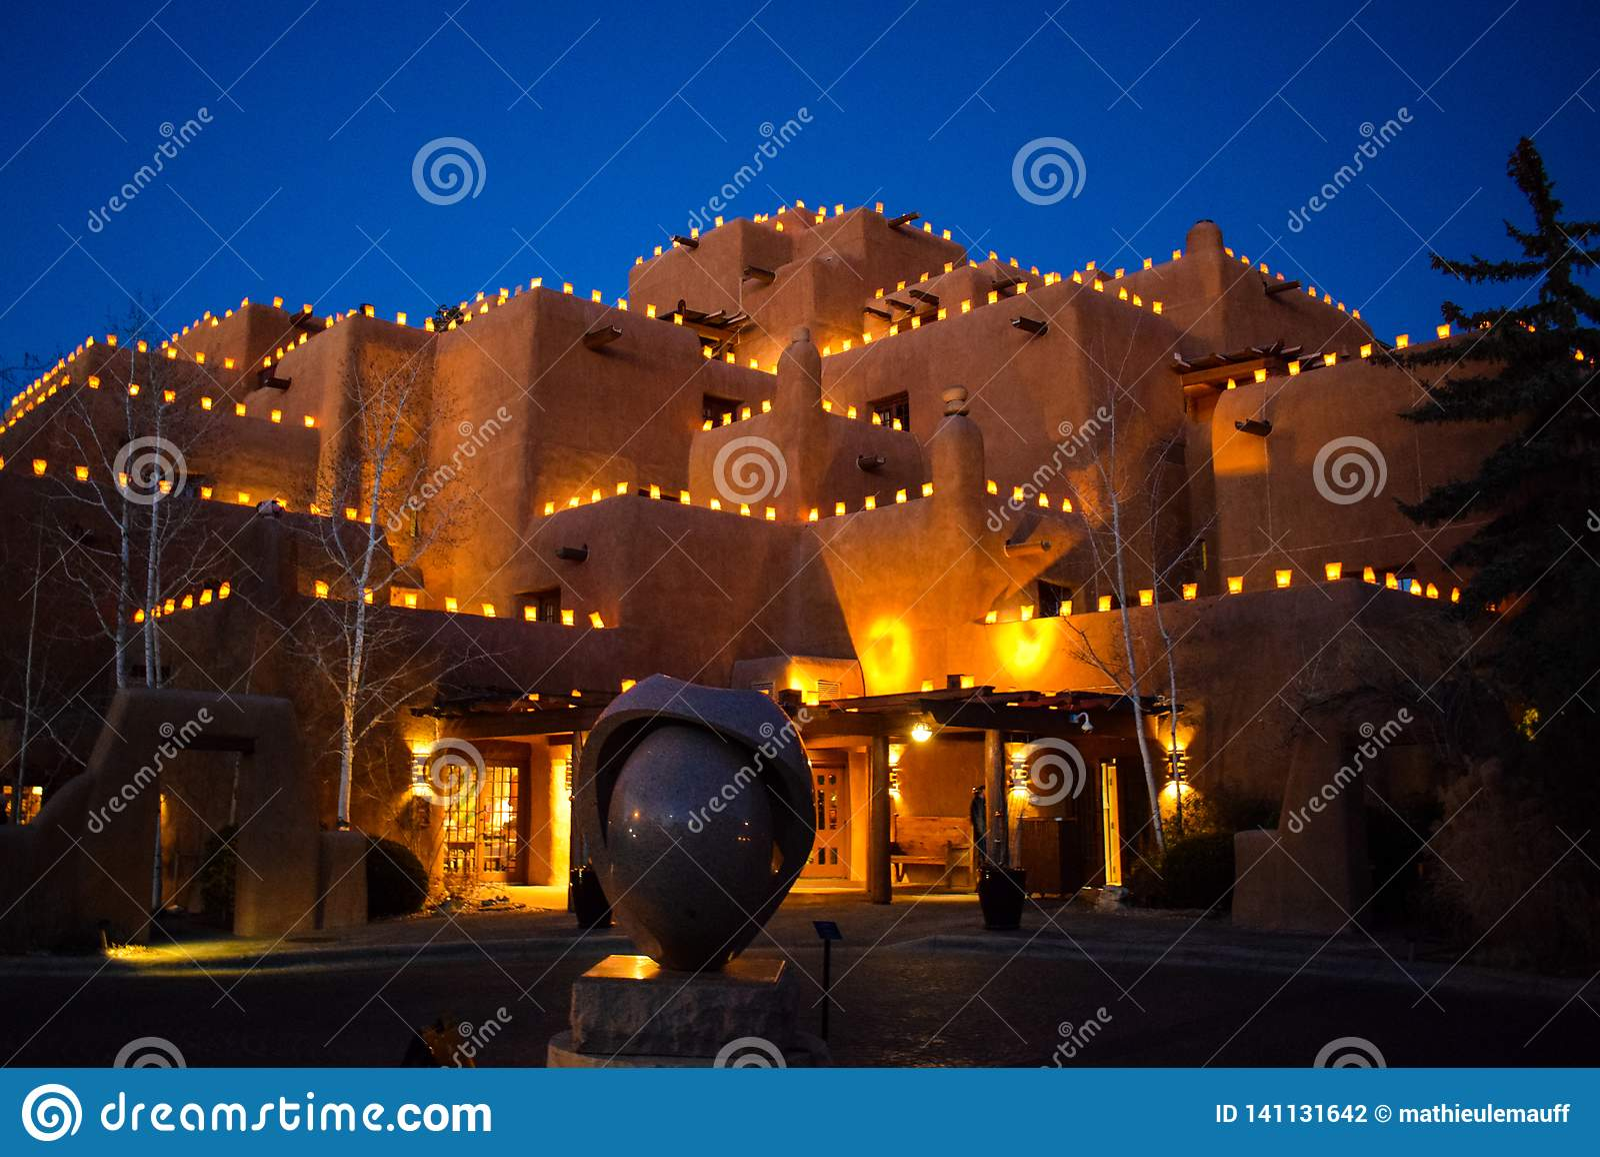 Santa Fe & x27; s Kersttijdlantaarns - Faralitos en Luminarias